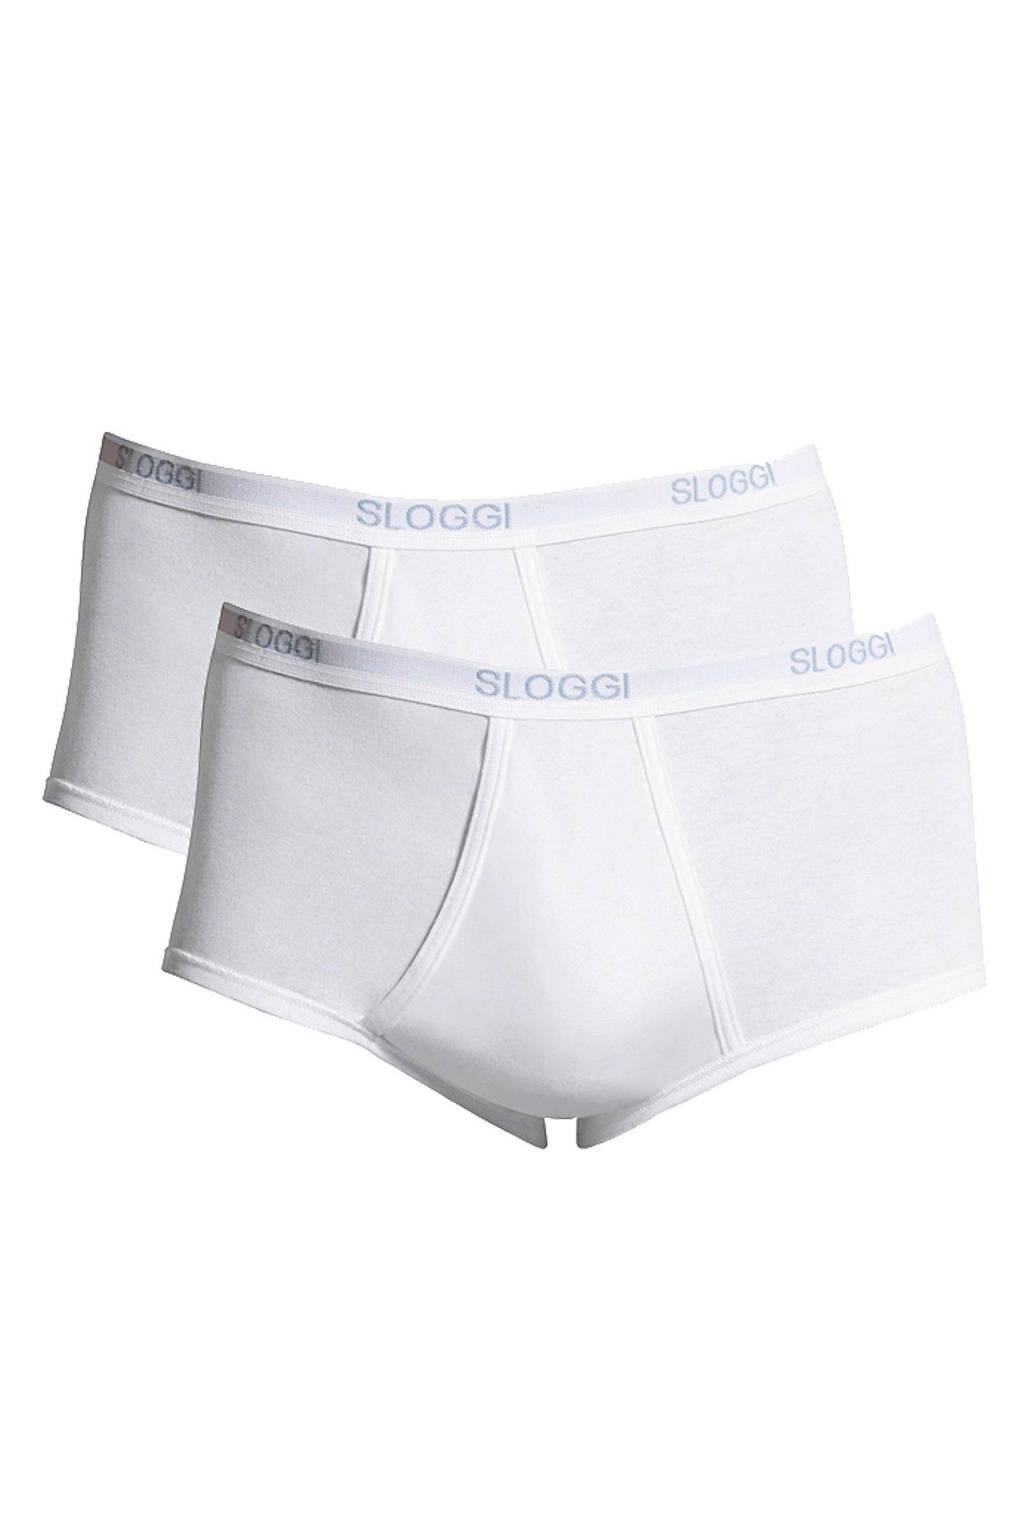 Sloggi Men Basic maxislip (set van 2) wit, Wit